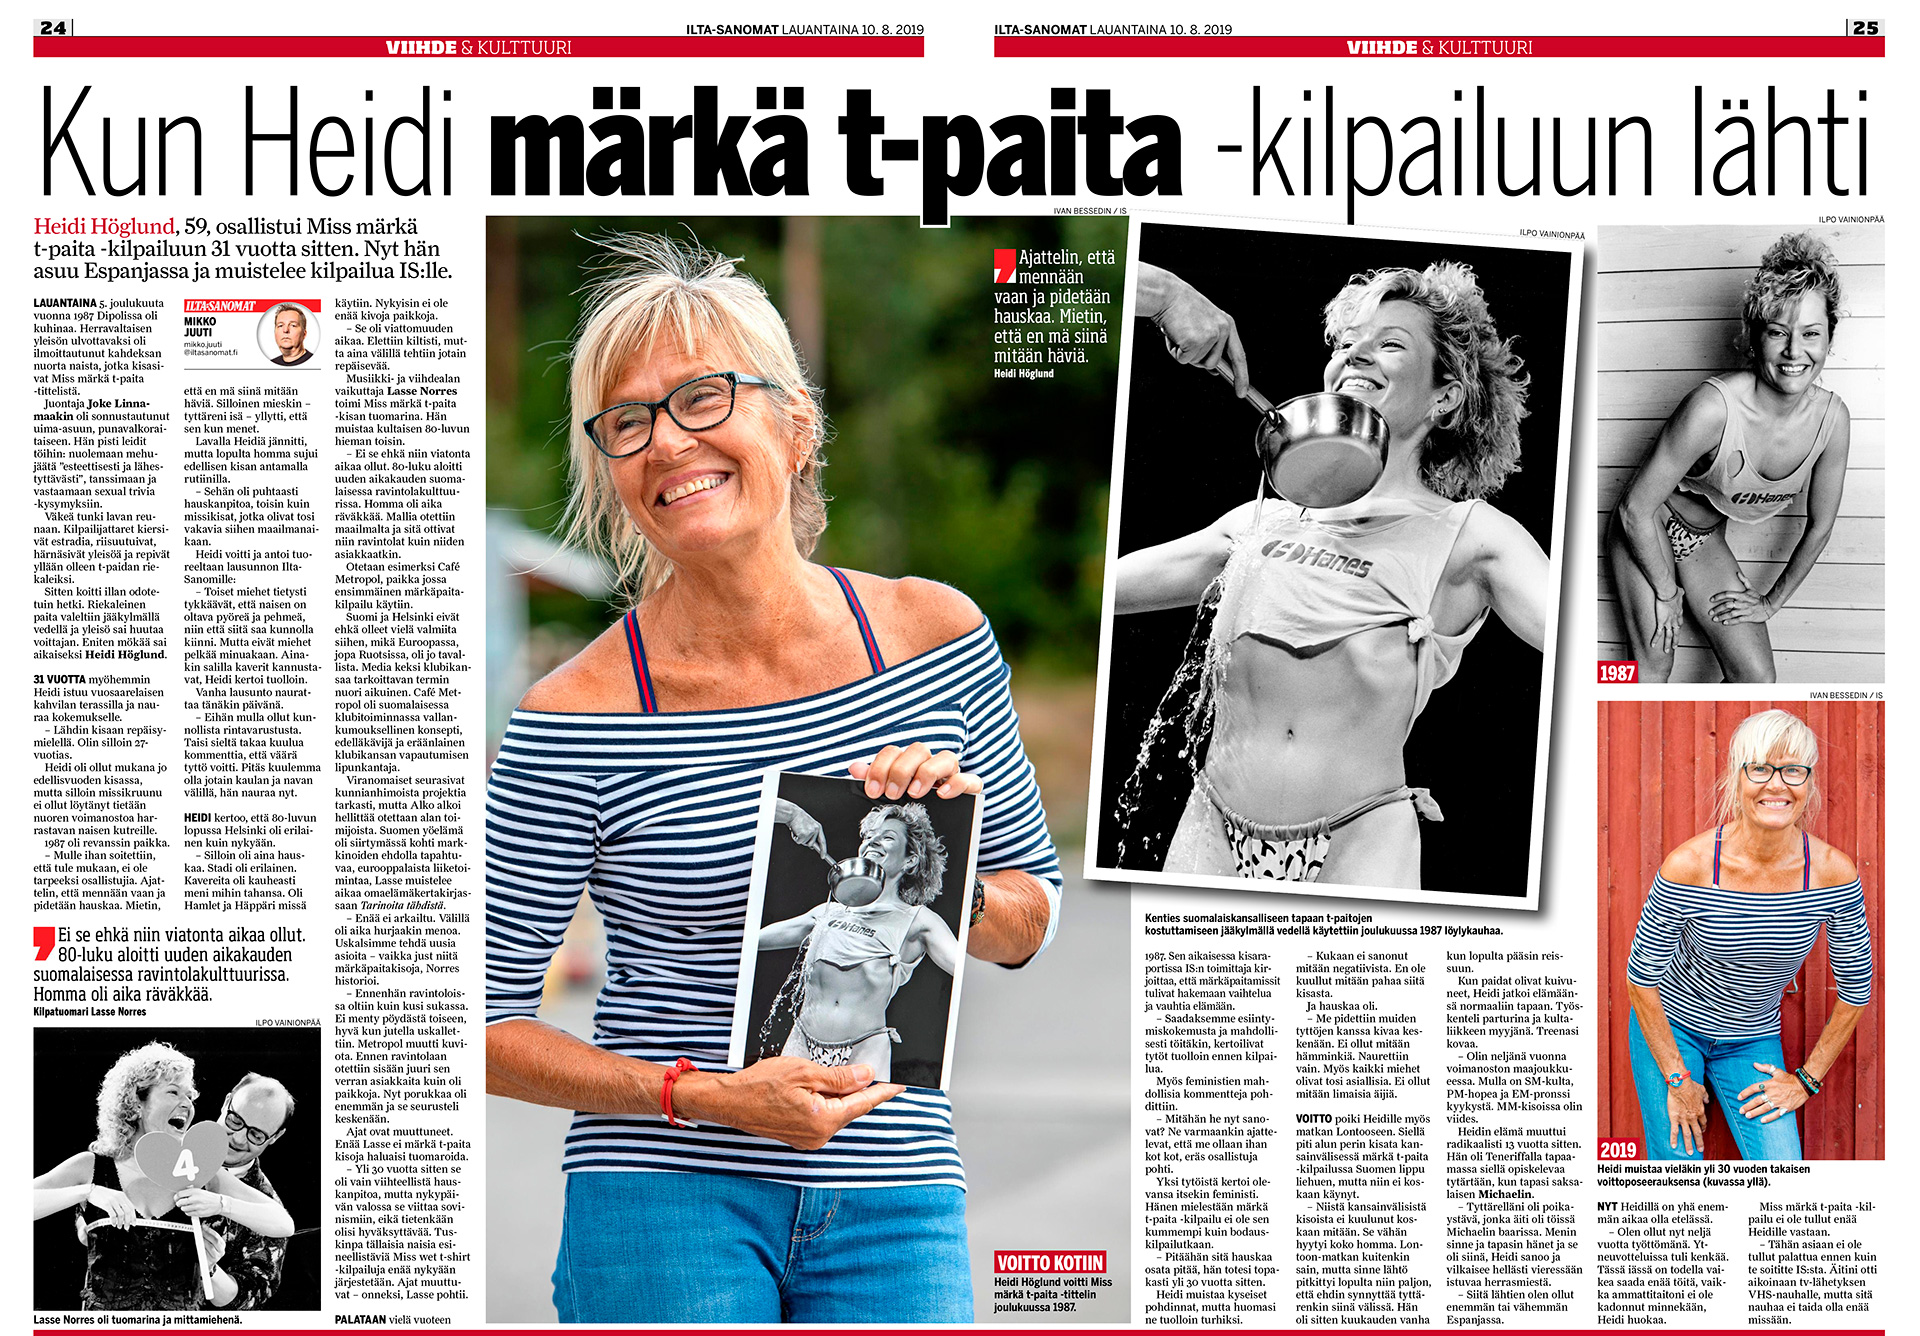 Ilta-Sanomat, Heidi Haglund, 1986 Miss Wet T-Shirt